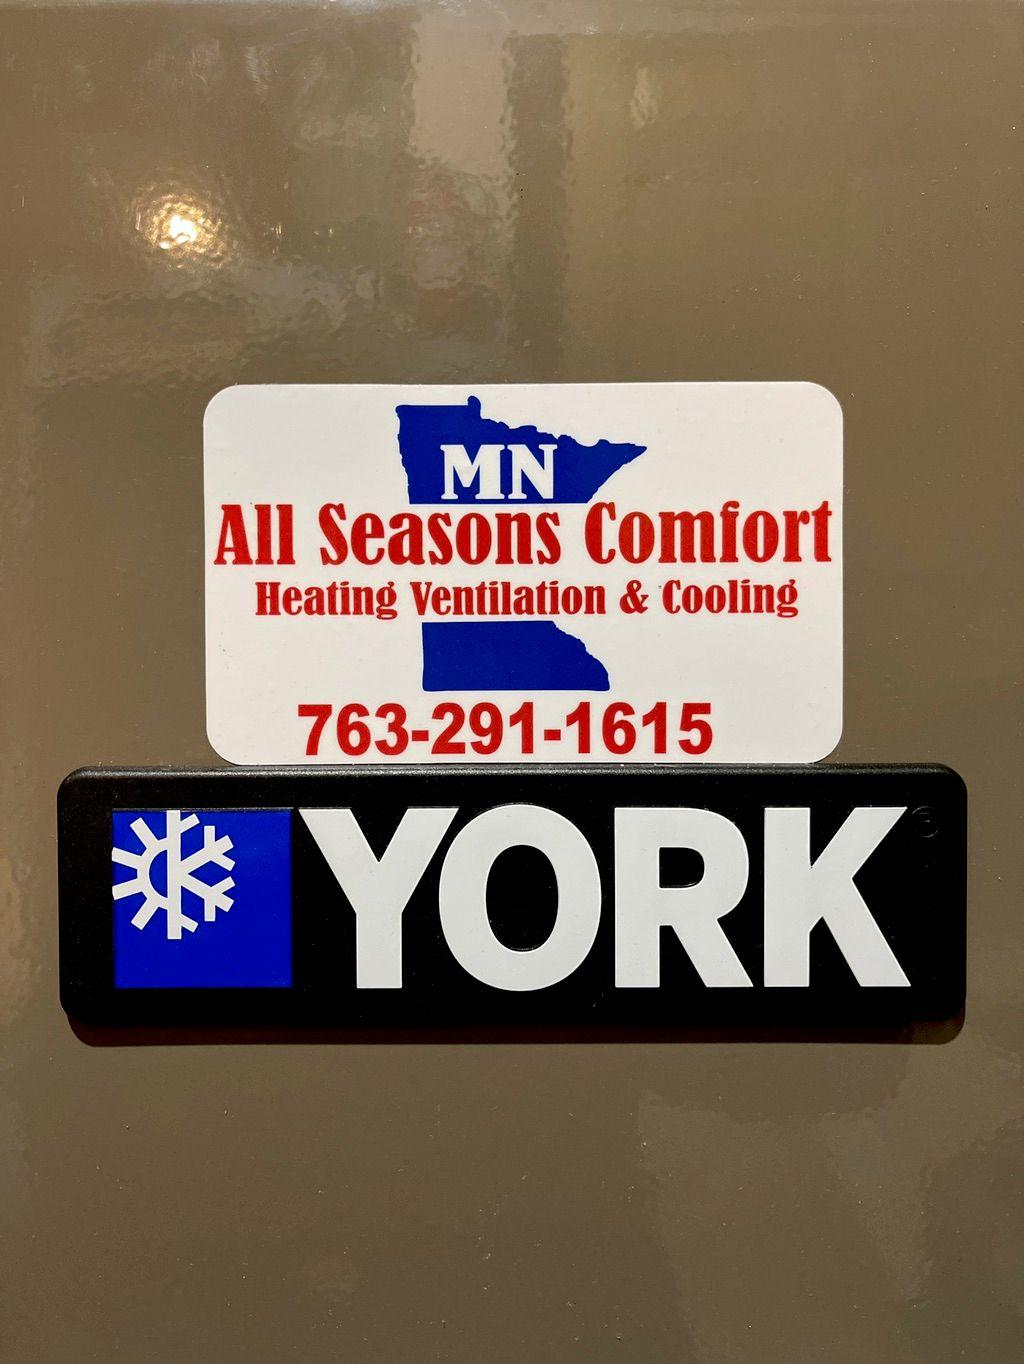 MN All Seasons Comfort LLC